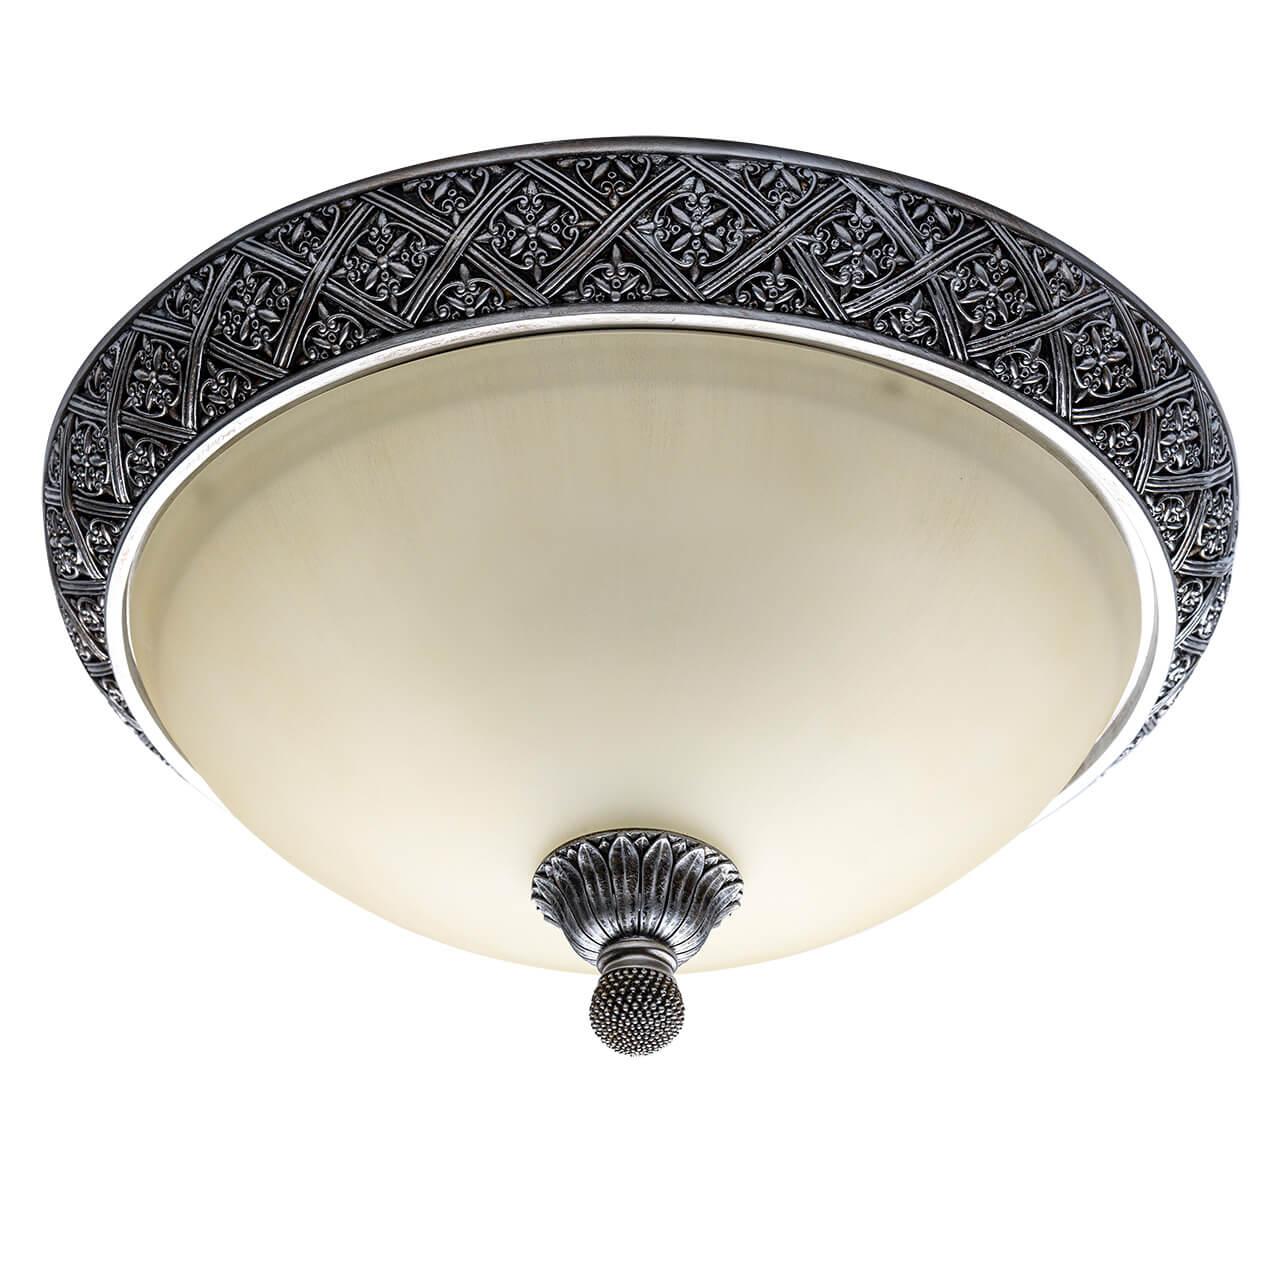 Потолочный светильник Chiaro Версаче 254015304 цена